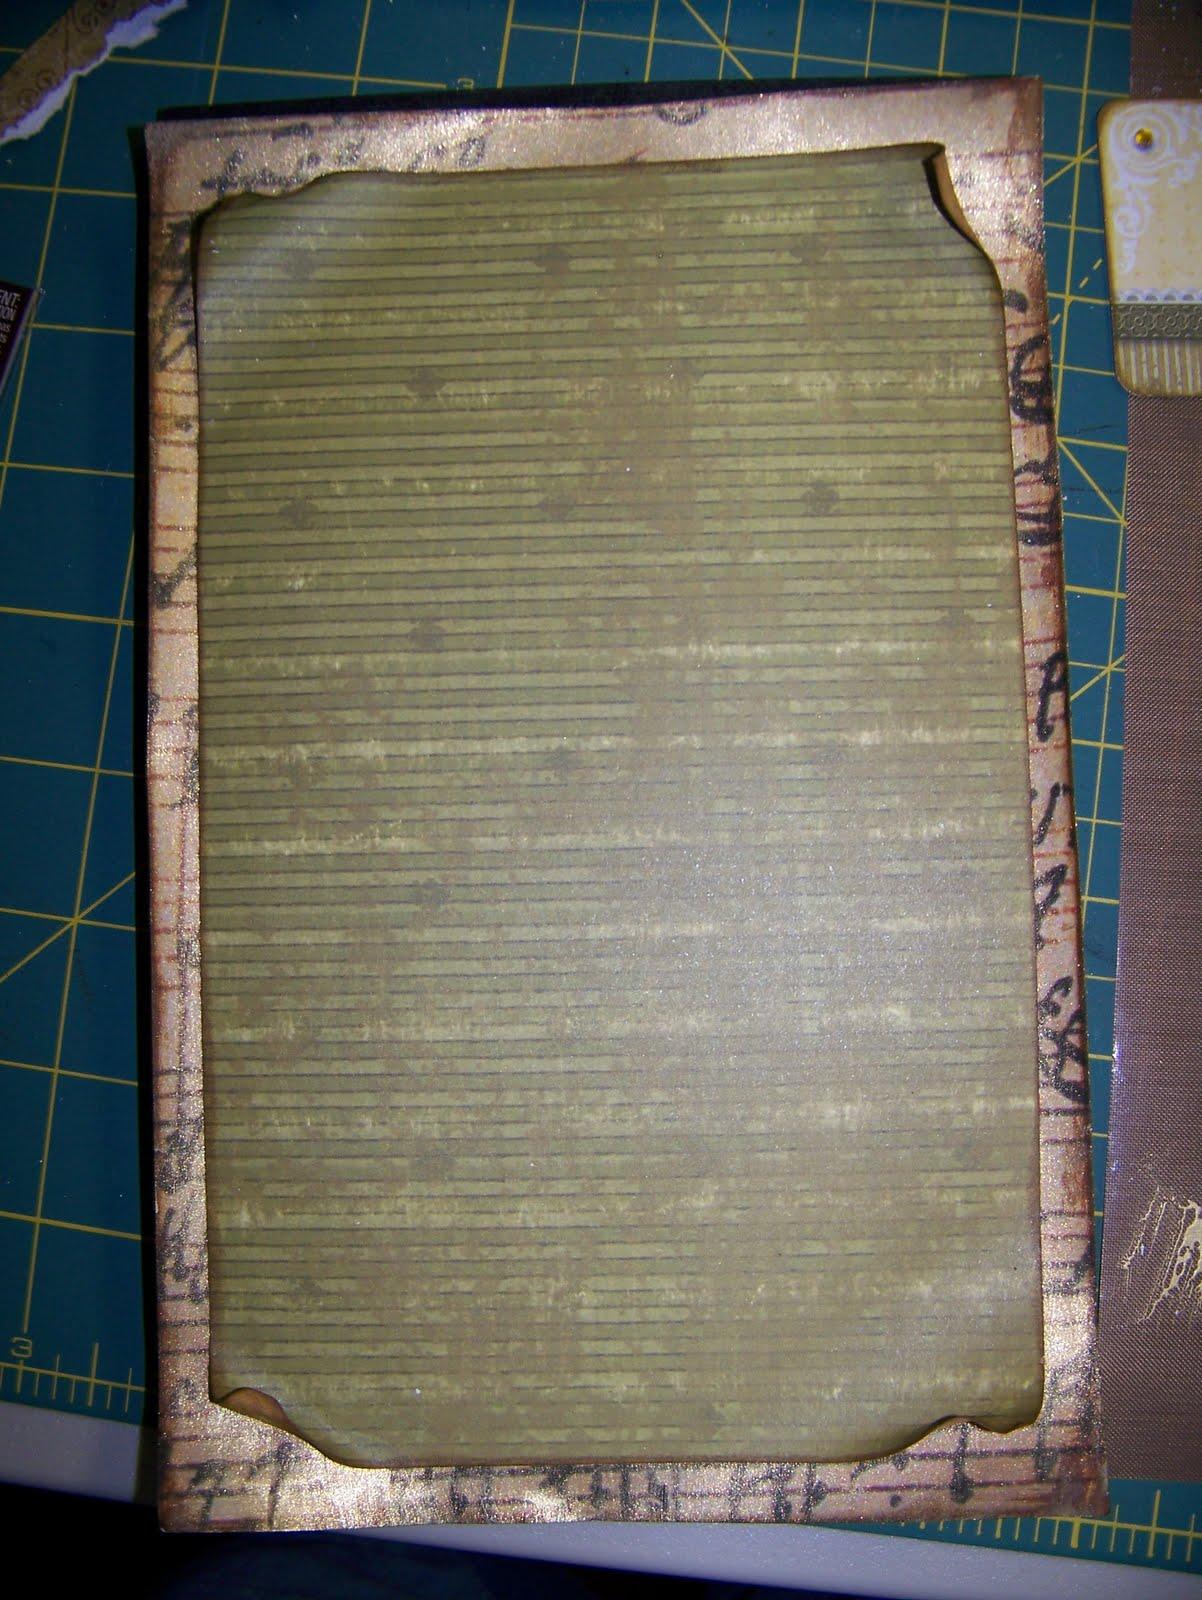 Scrapbook paper dollar general - Using A Foam Brush I Lightly Brushed On A Bit Of Sheer Gold Glaze Over My Patterned Paper